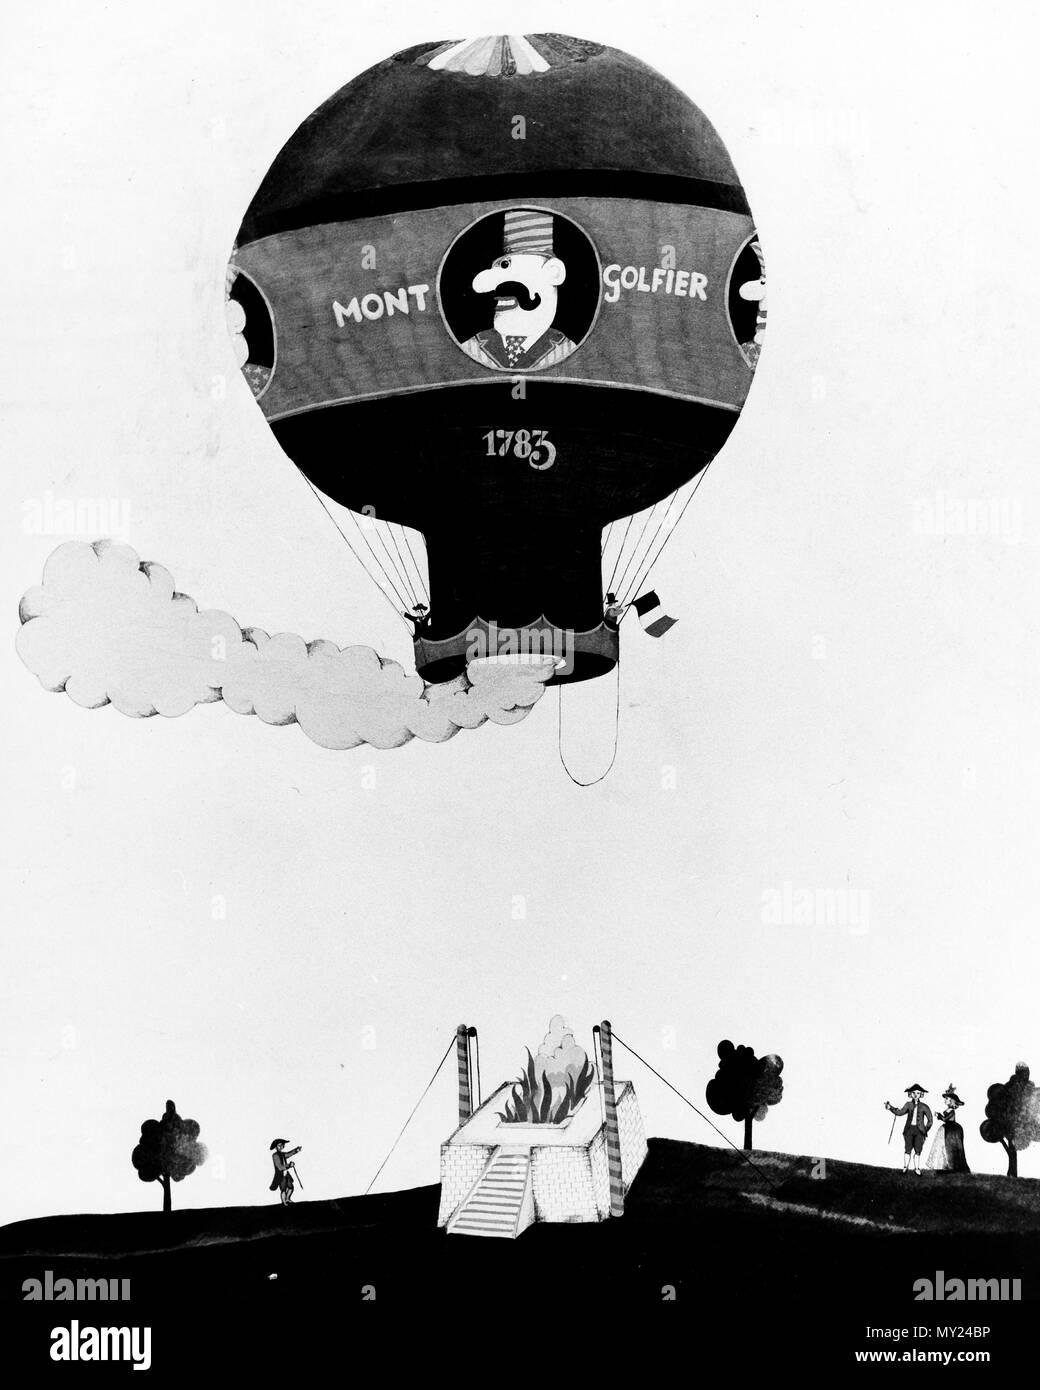 Plumpaquatsch, Kinderunterhaltungssendung, Deutschland 1972 - Szenenfoto Montgolfiere 1975, Imagens de Stock